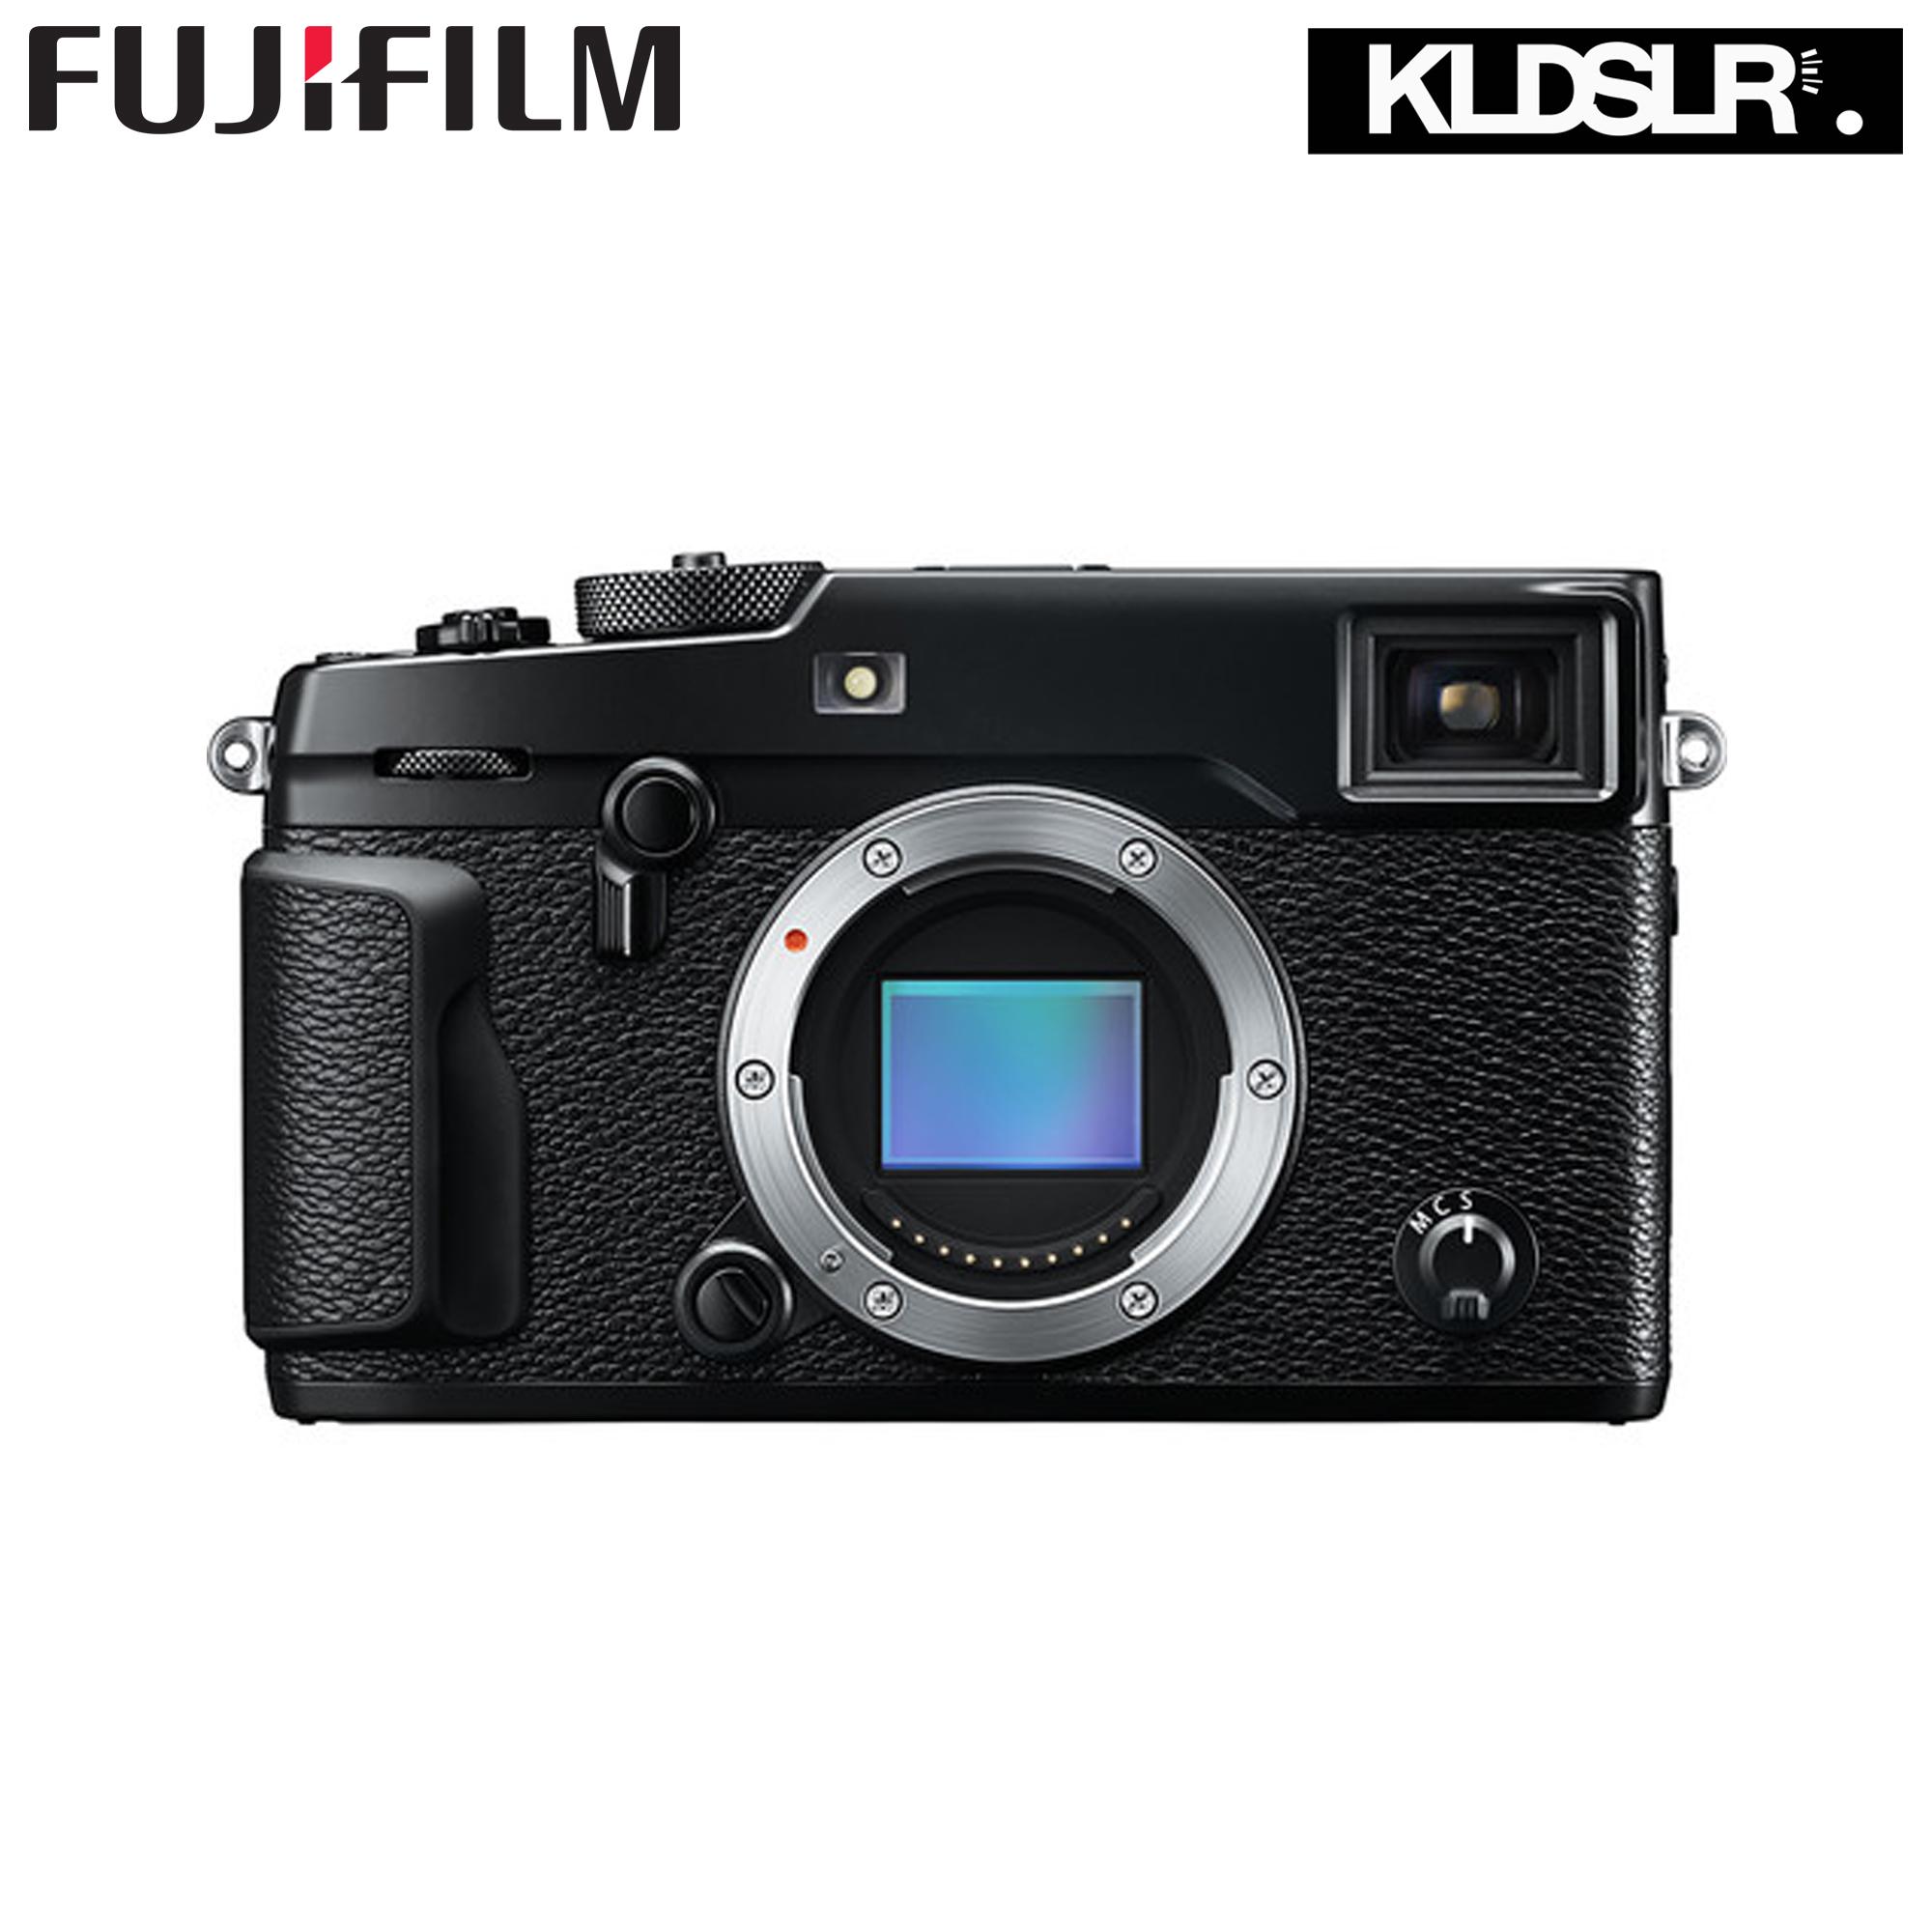 Fujifilm X Pro2 Mirrorless Digital Camera Body Only Xt2 Malaysia